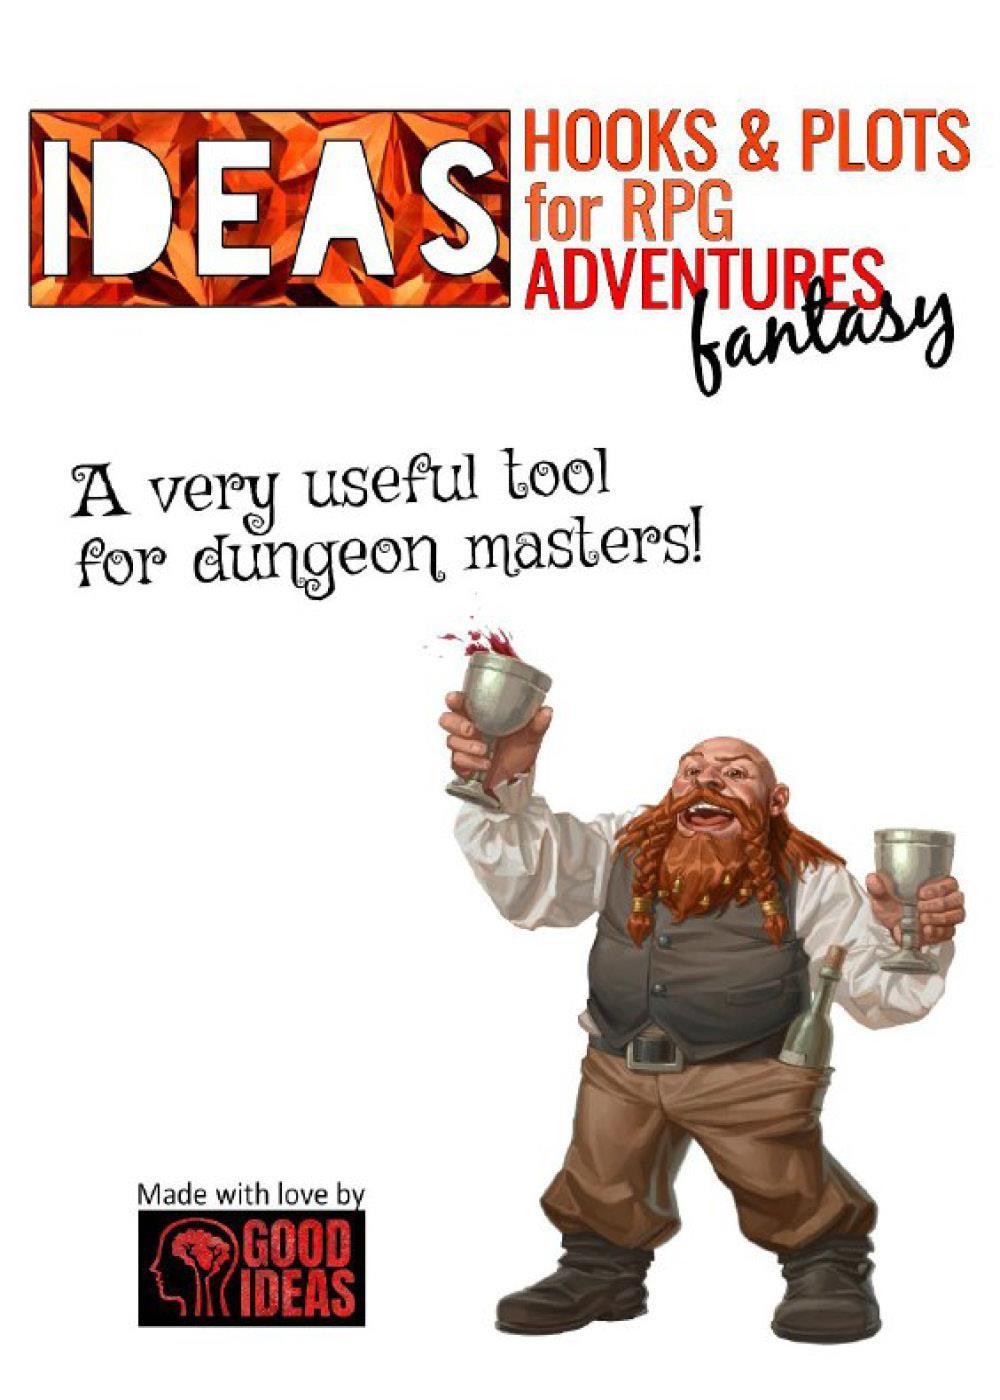 IDEAS! Hooks & Plots for RPG fantasy adventures